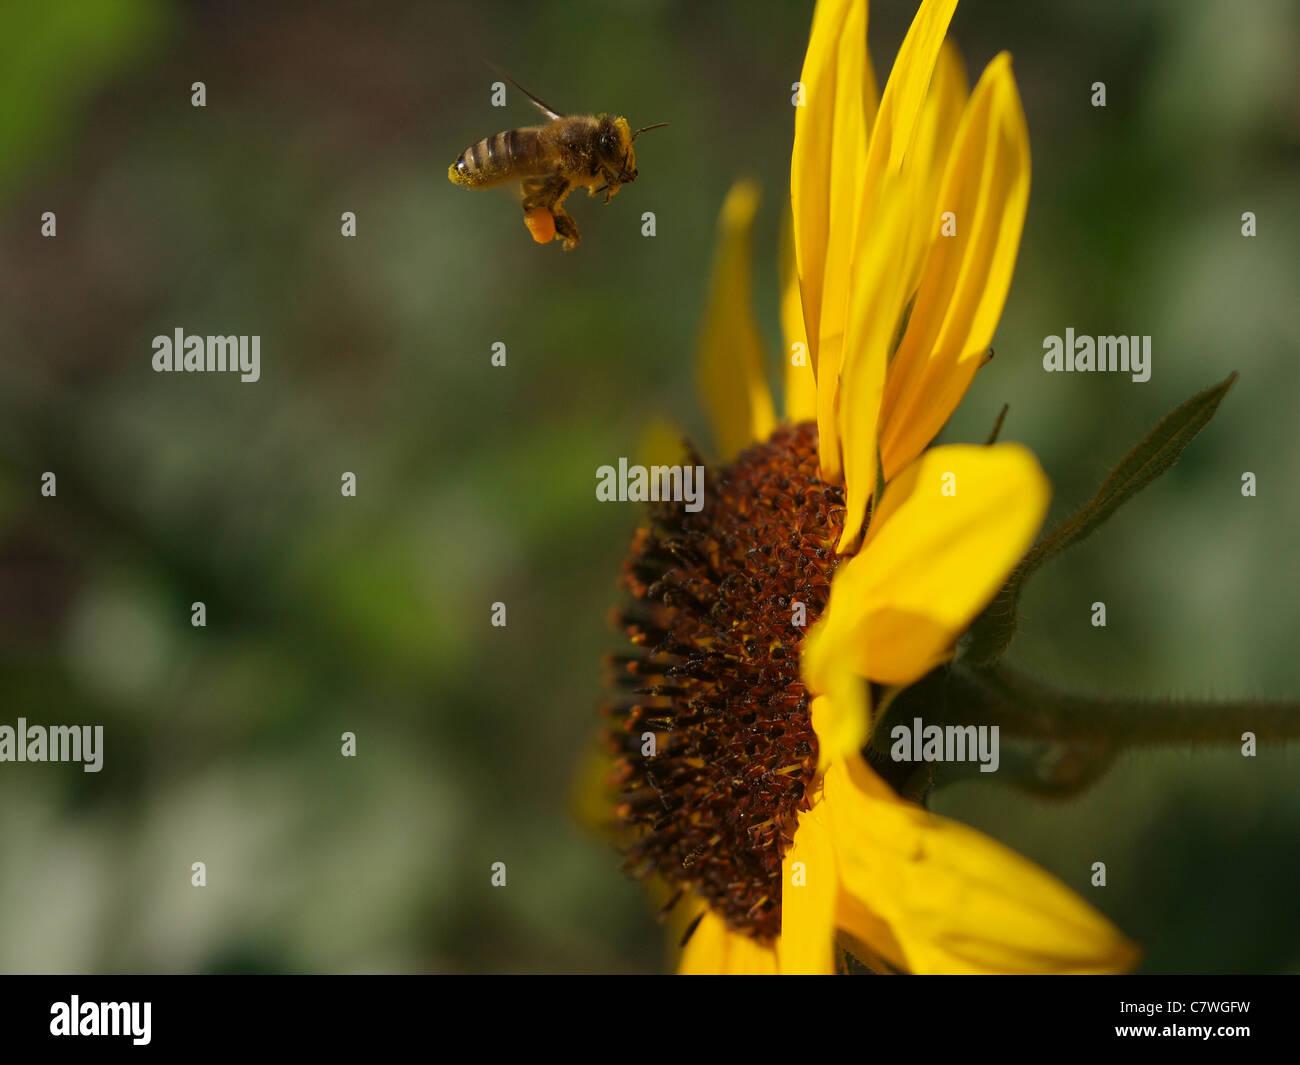 American Honeybee (Apis mellifera) - Stock Image